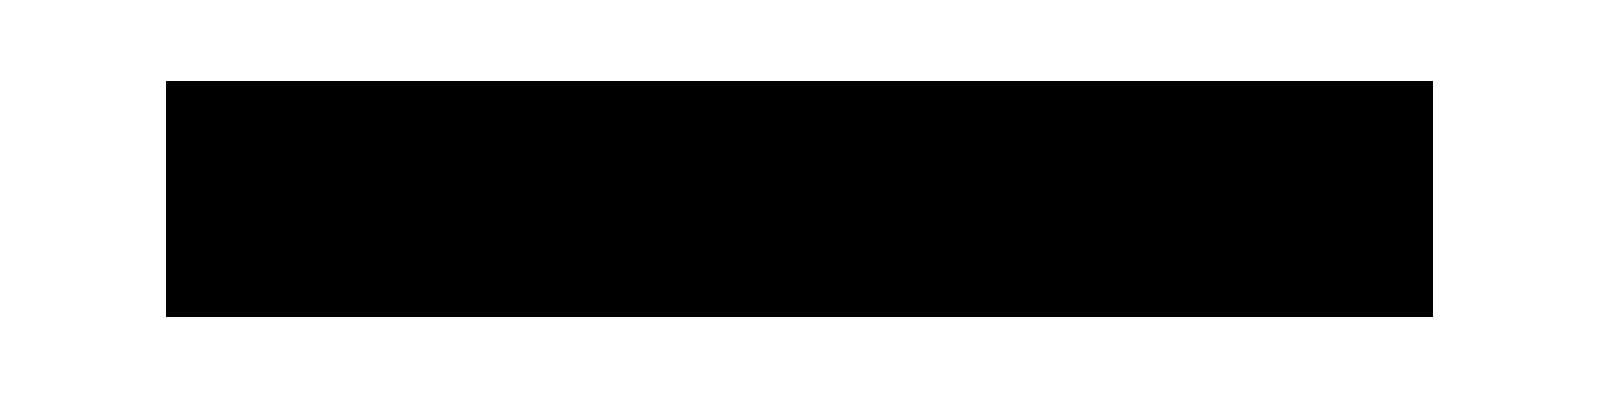 Chase_logo_2007_BLACK BIG.png